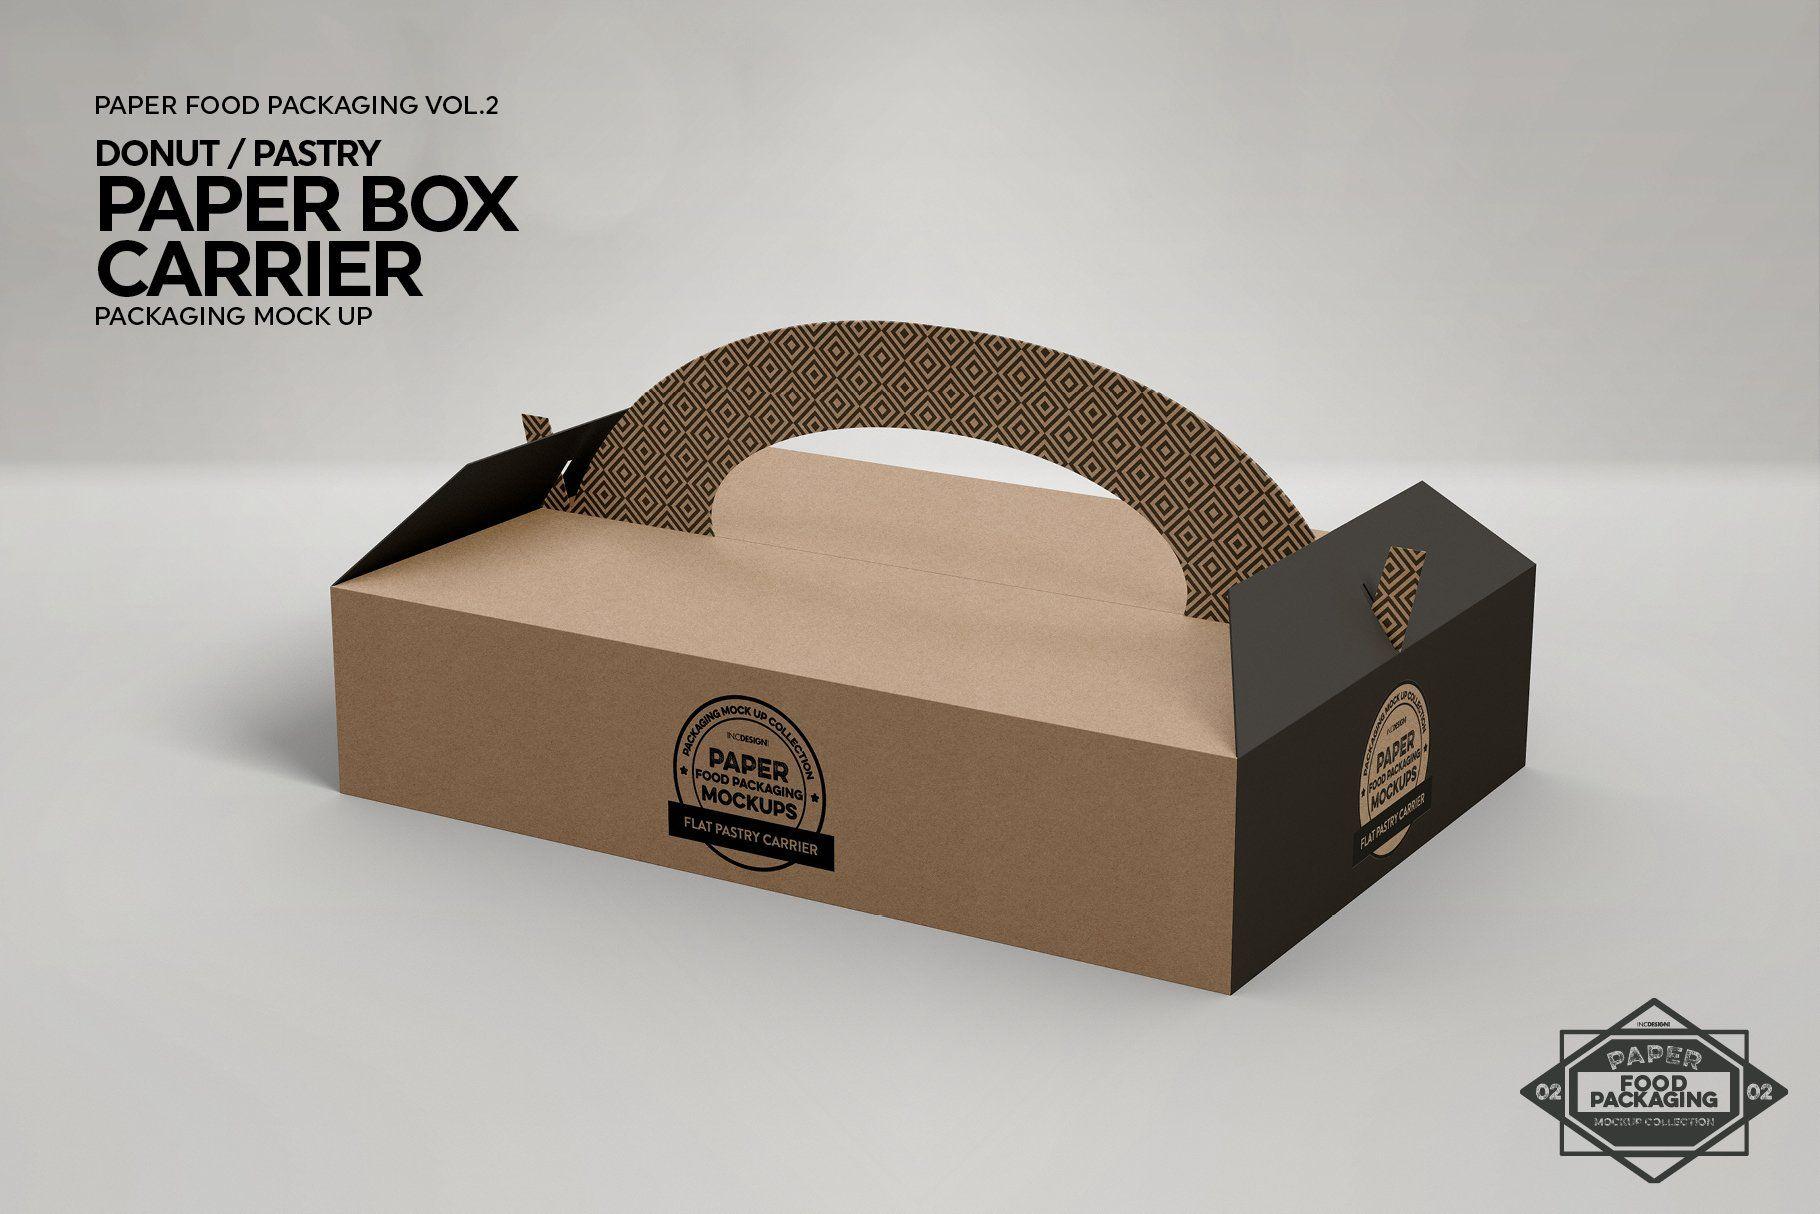 Download Vol 2 Food Box Packaging Mockups Free Packaging Mockup Packaging Mockup Design Mockup Free